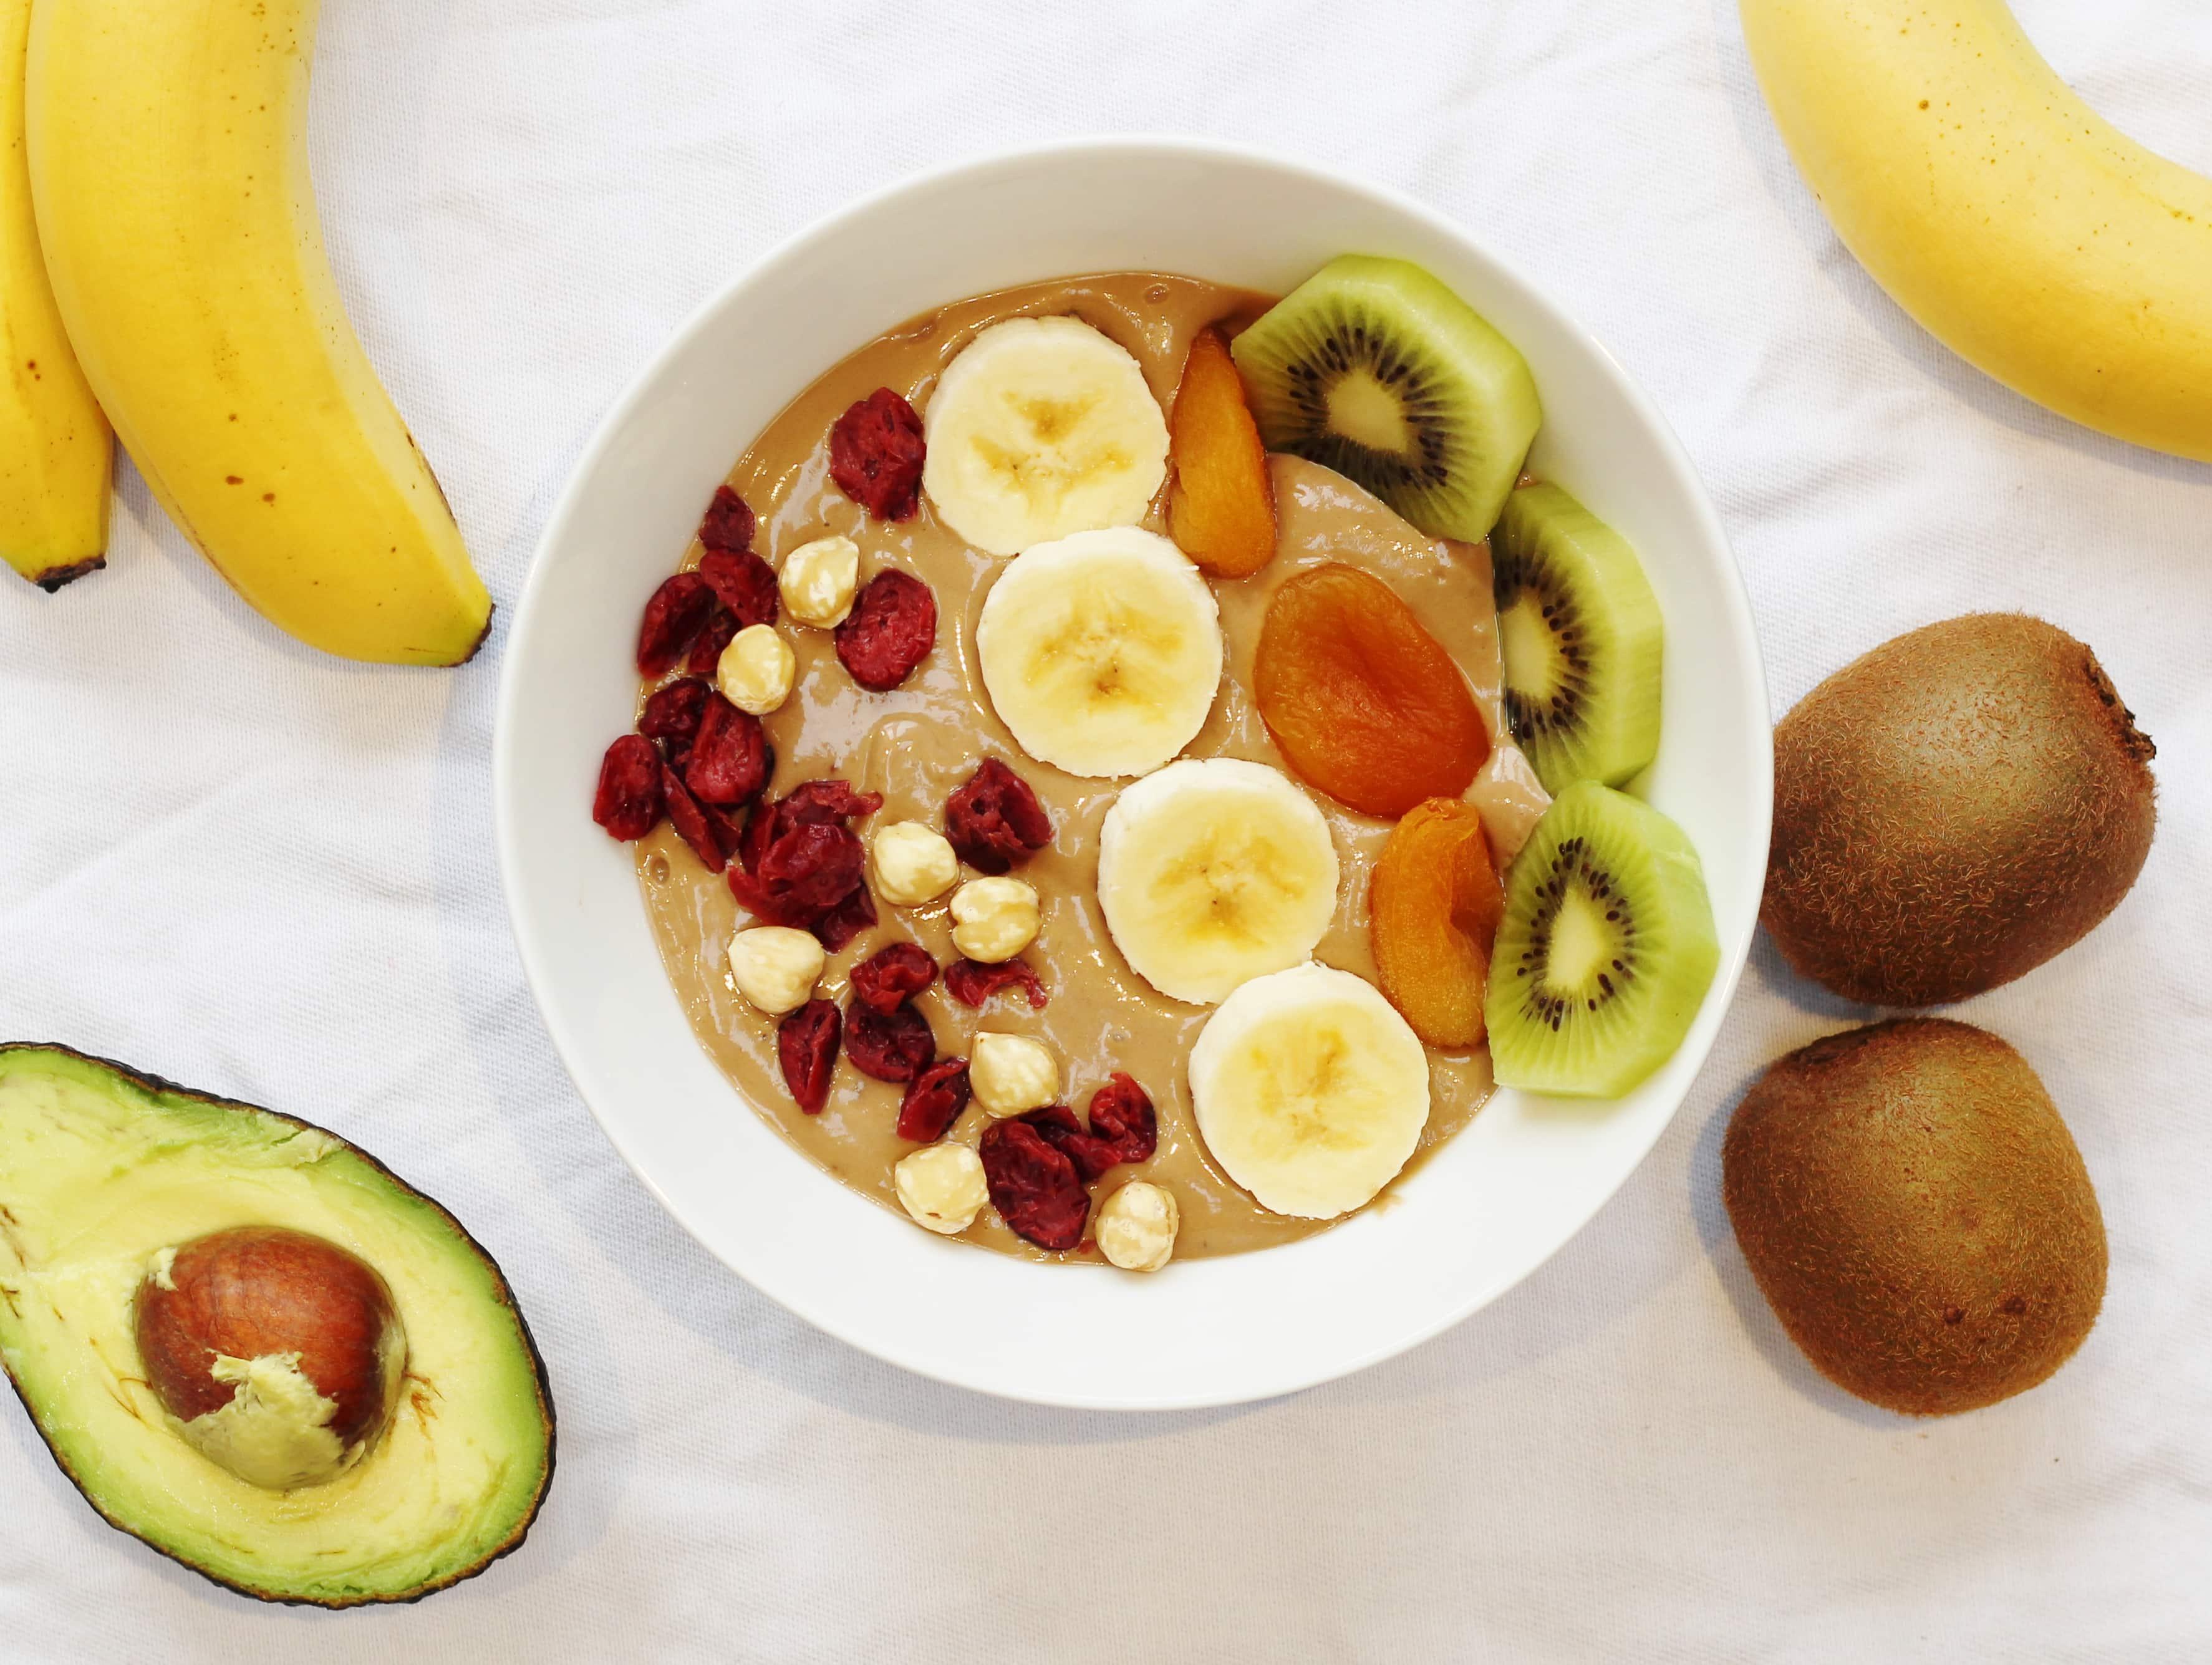 Nutella Banana and Avocado Smoothie Bowl